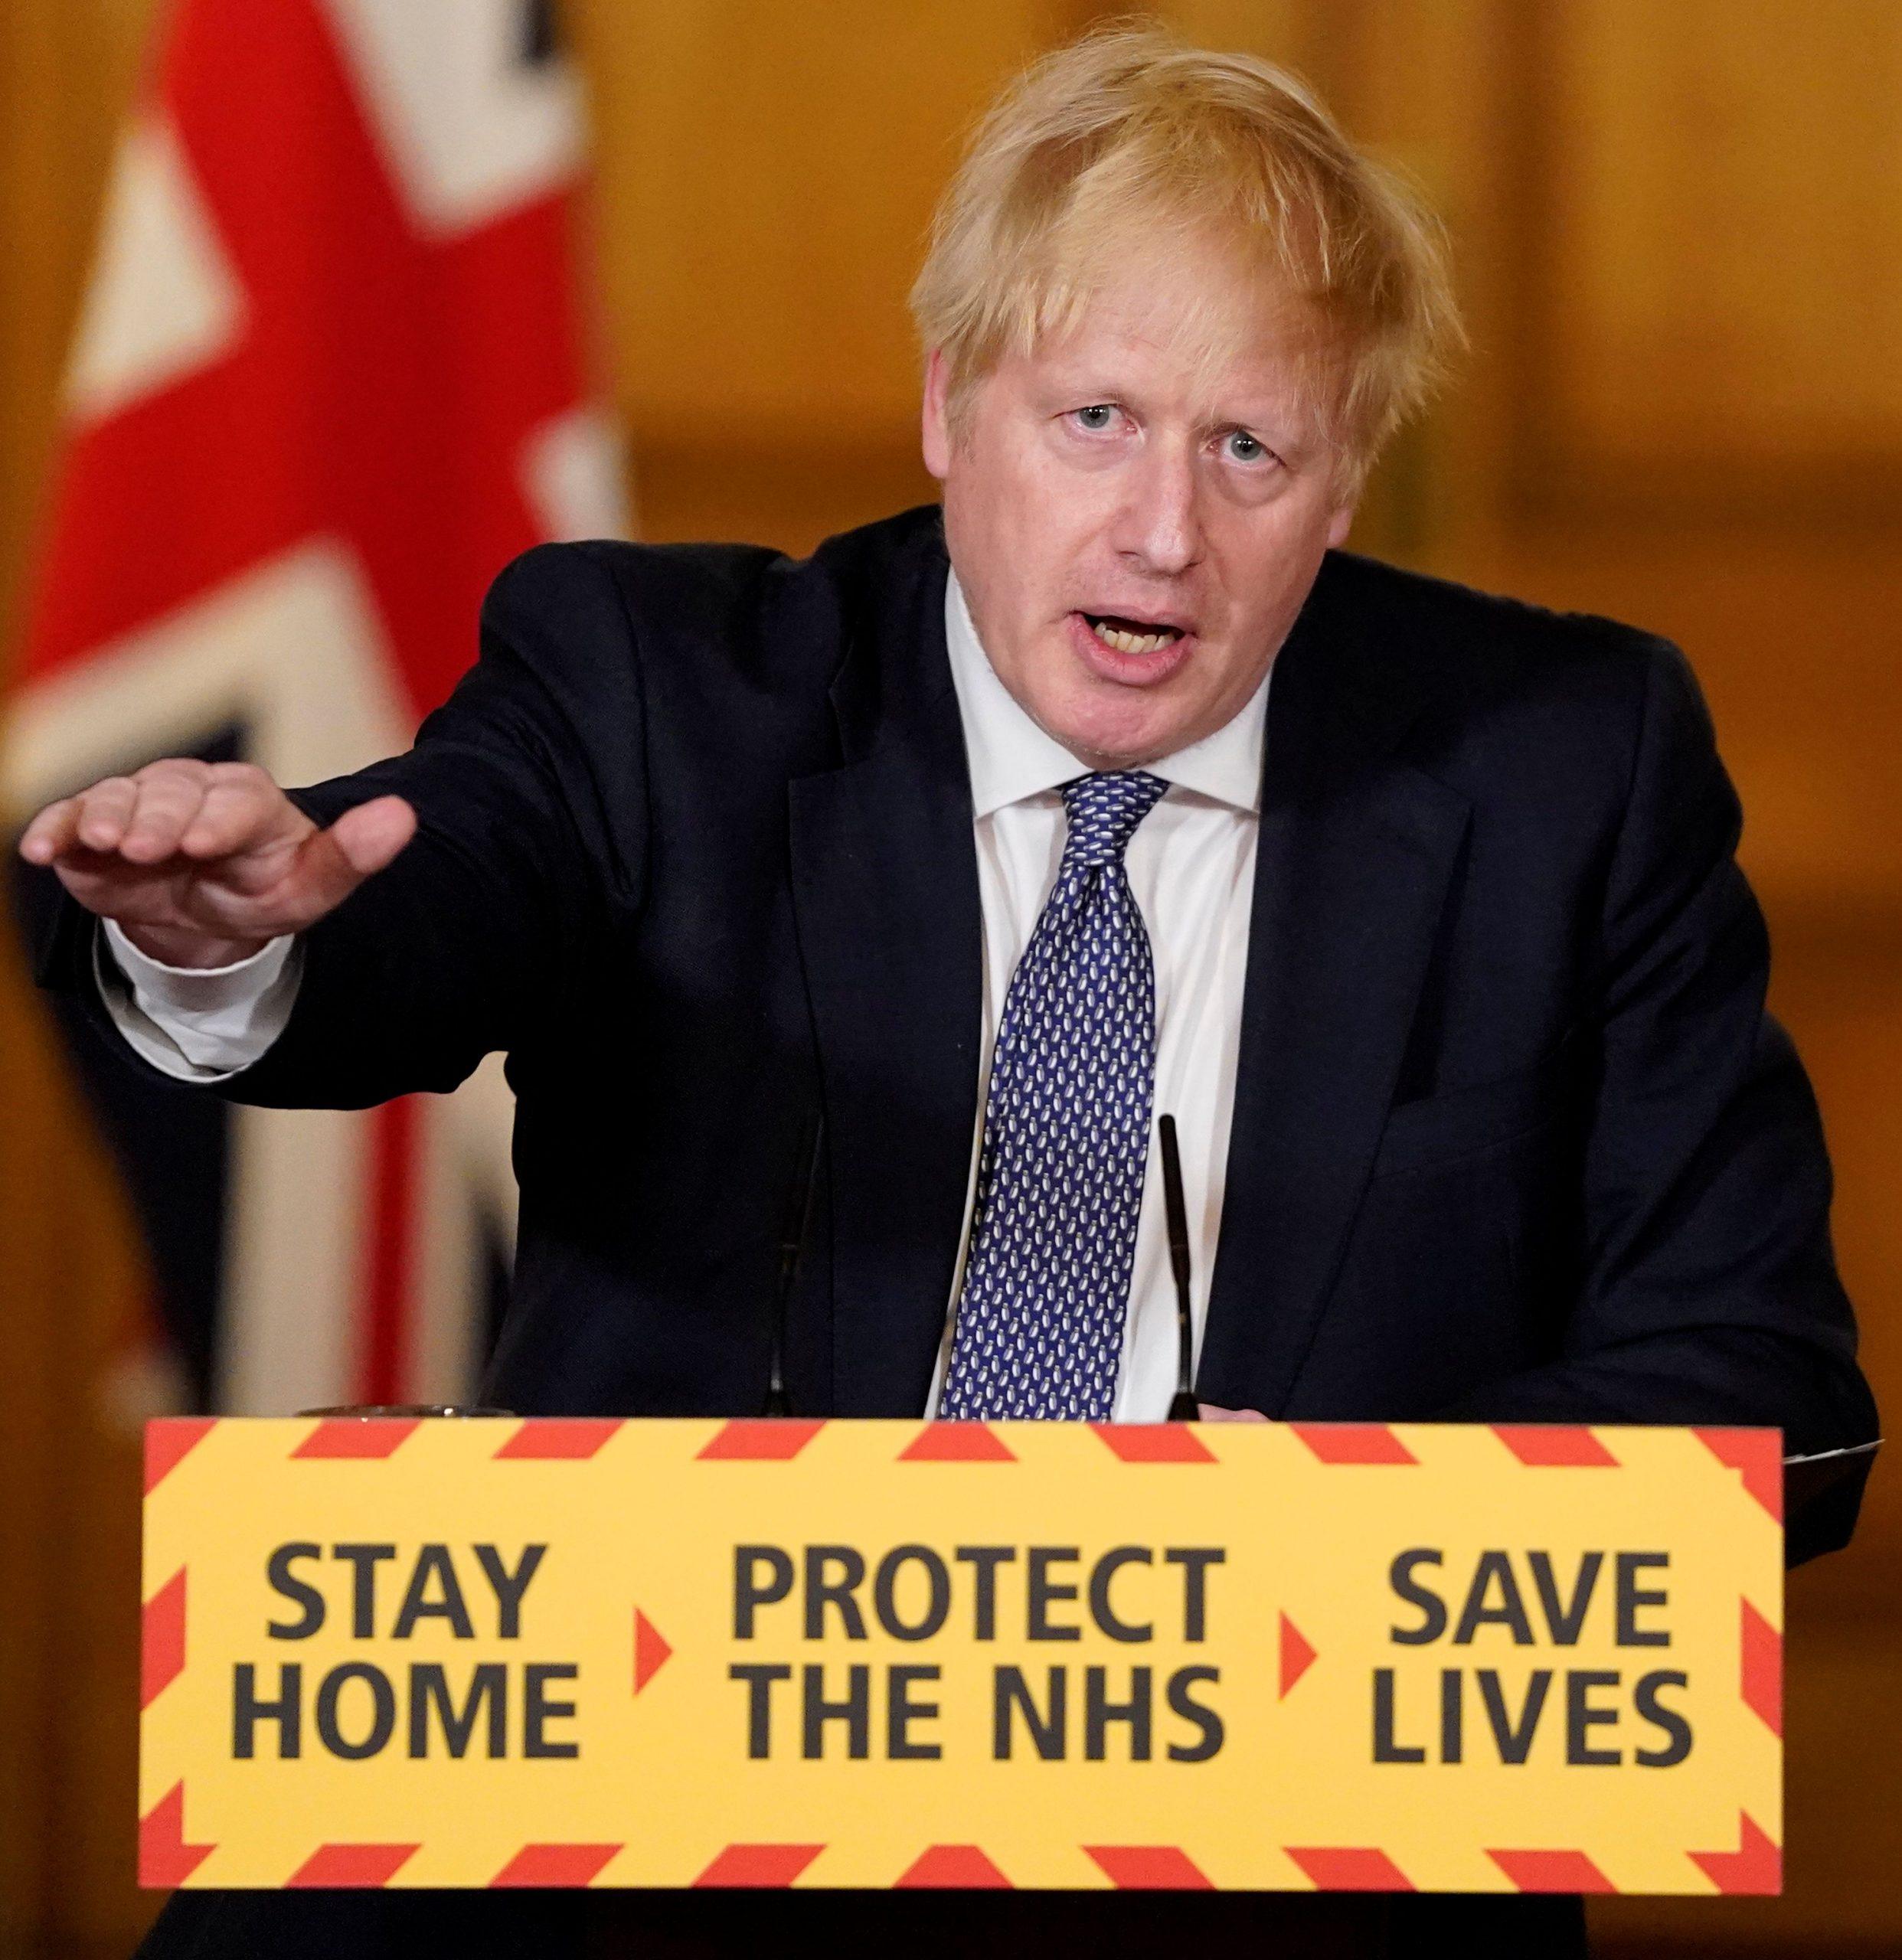 Prime Minister Boris Johnson (Andrew Parsons/No 10 Downing Street/Handout via REUTERS)